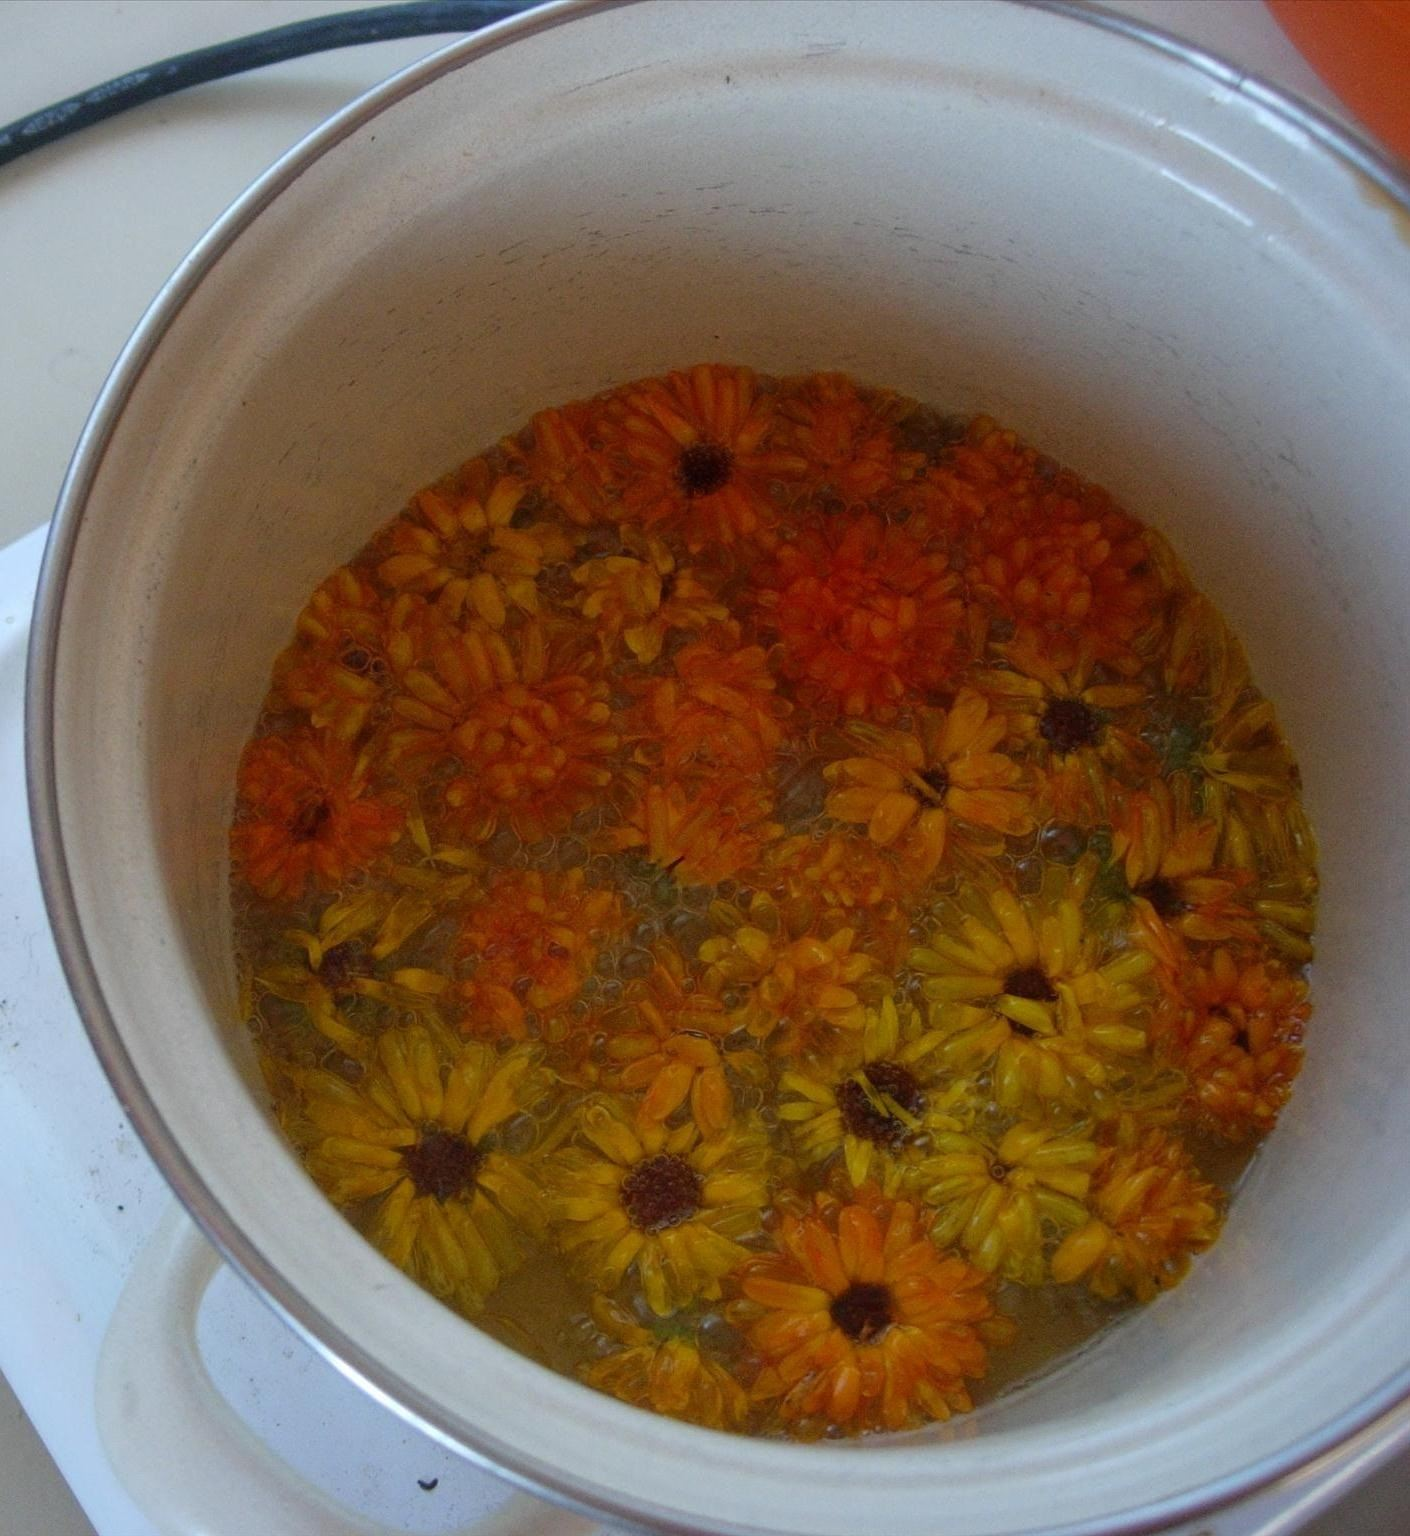 How to Make a Natural Marigold Cream